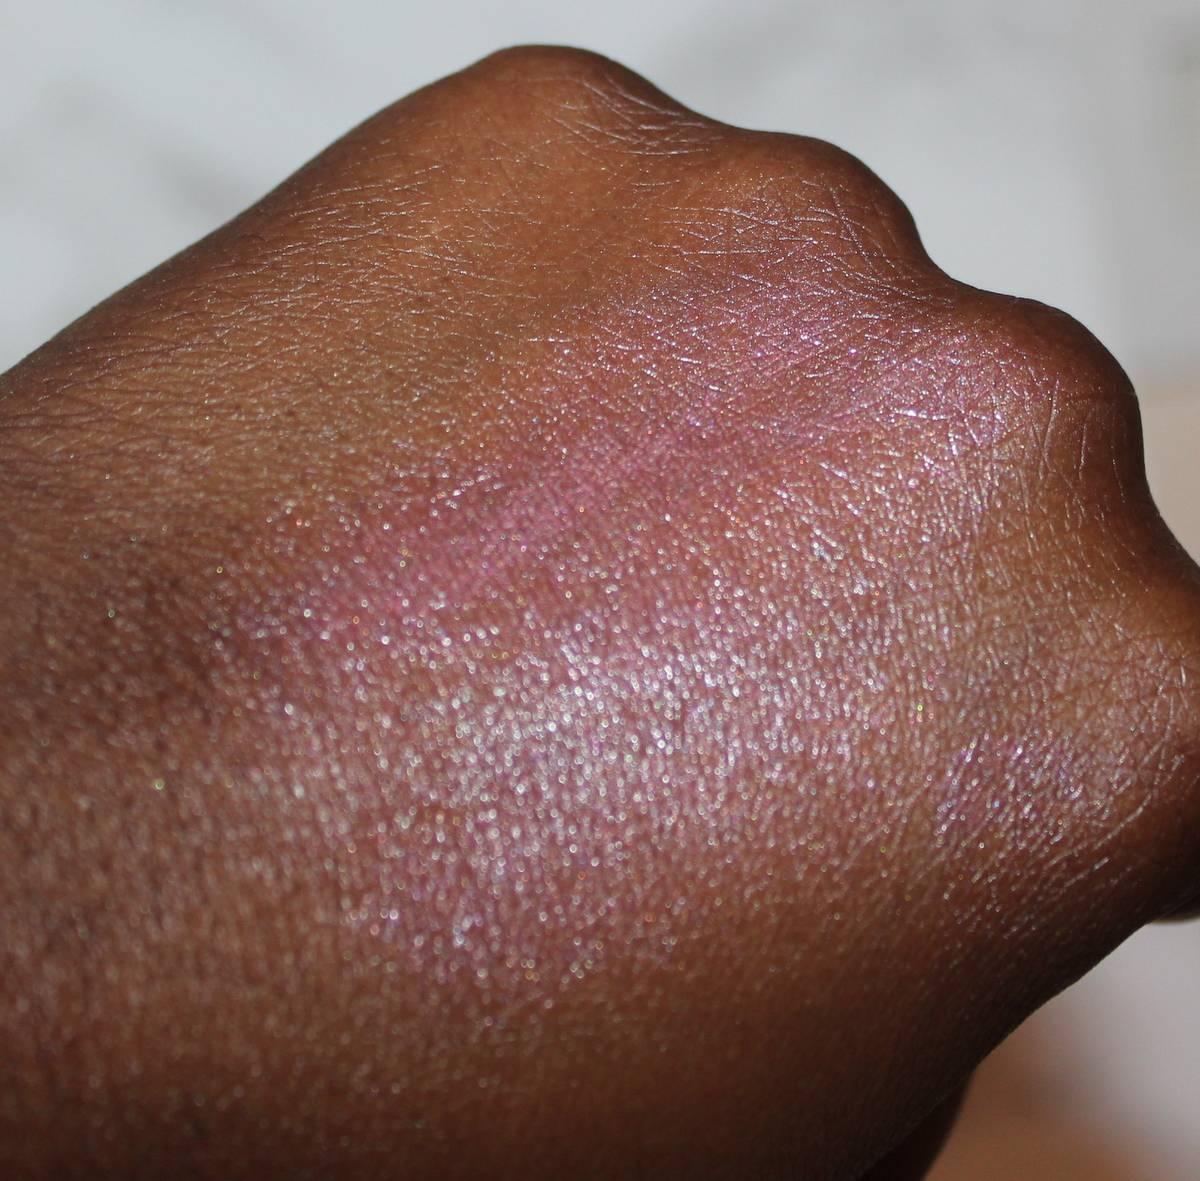 GOSH SS17 Urban Nature Lumi Drops Blusher (Coral) Dark Skin Swatch